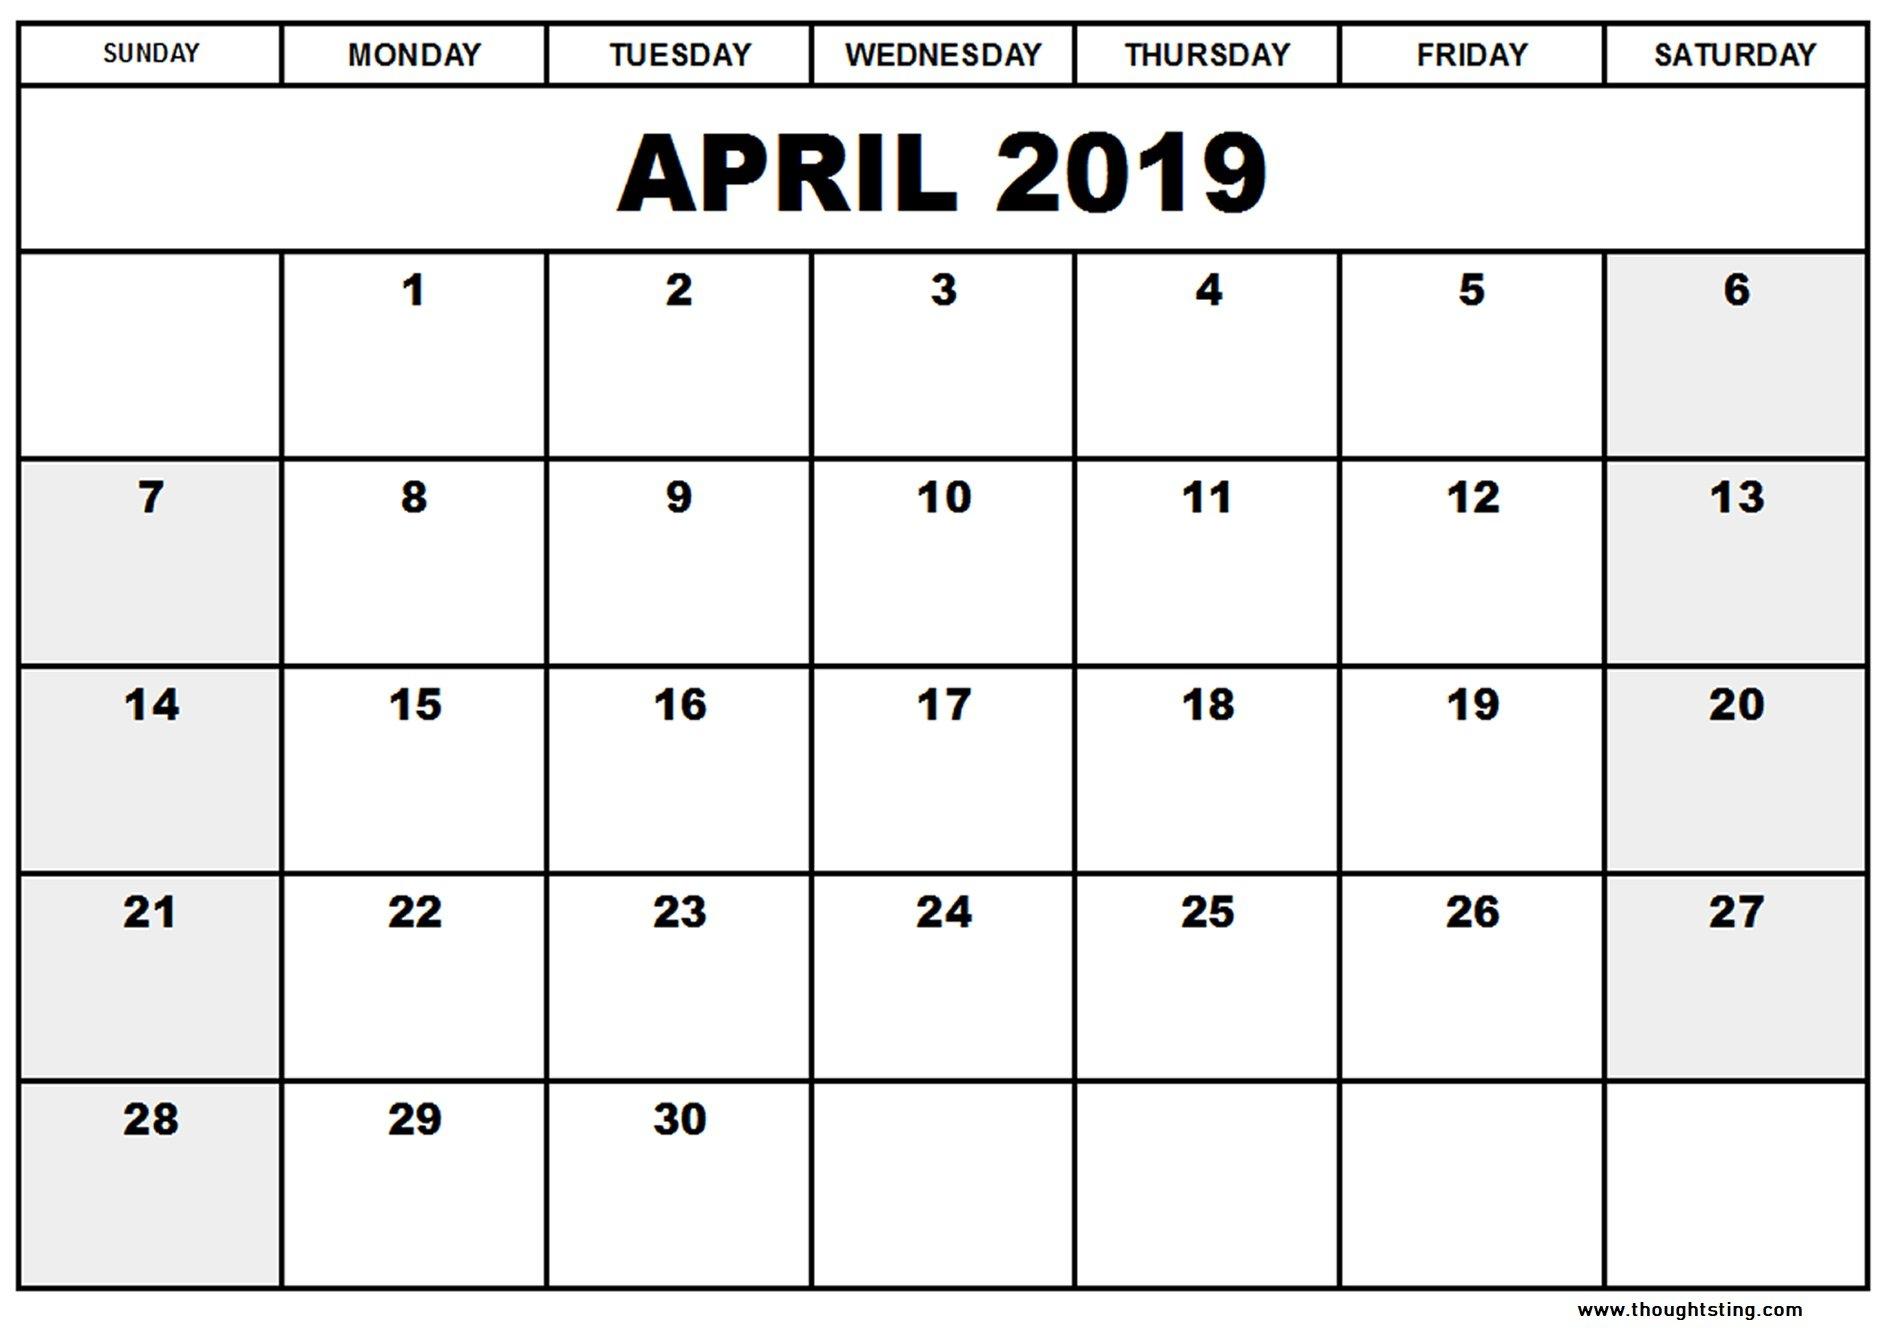 April 2019 Calendar Template Word, Excel, Pdf – Free Printable Calendar 2019 Template Word